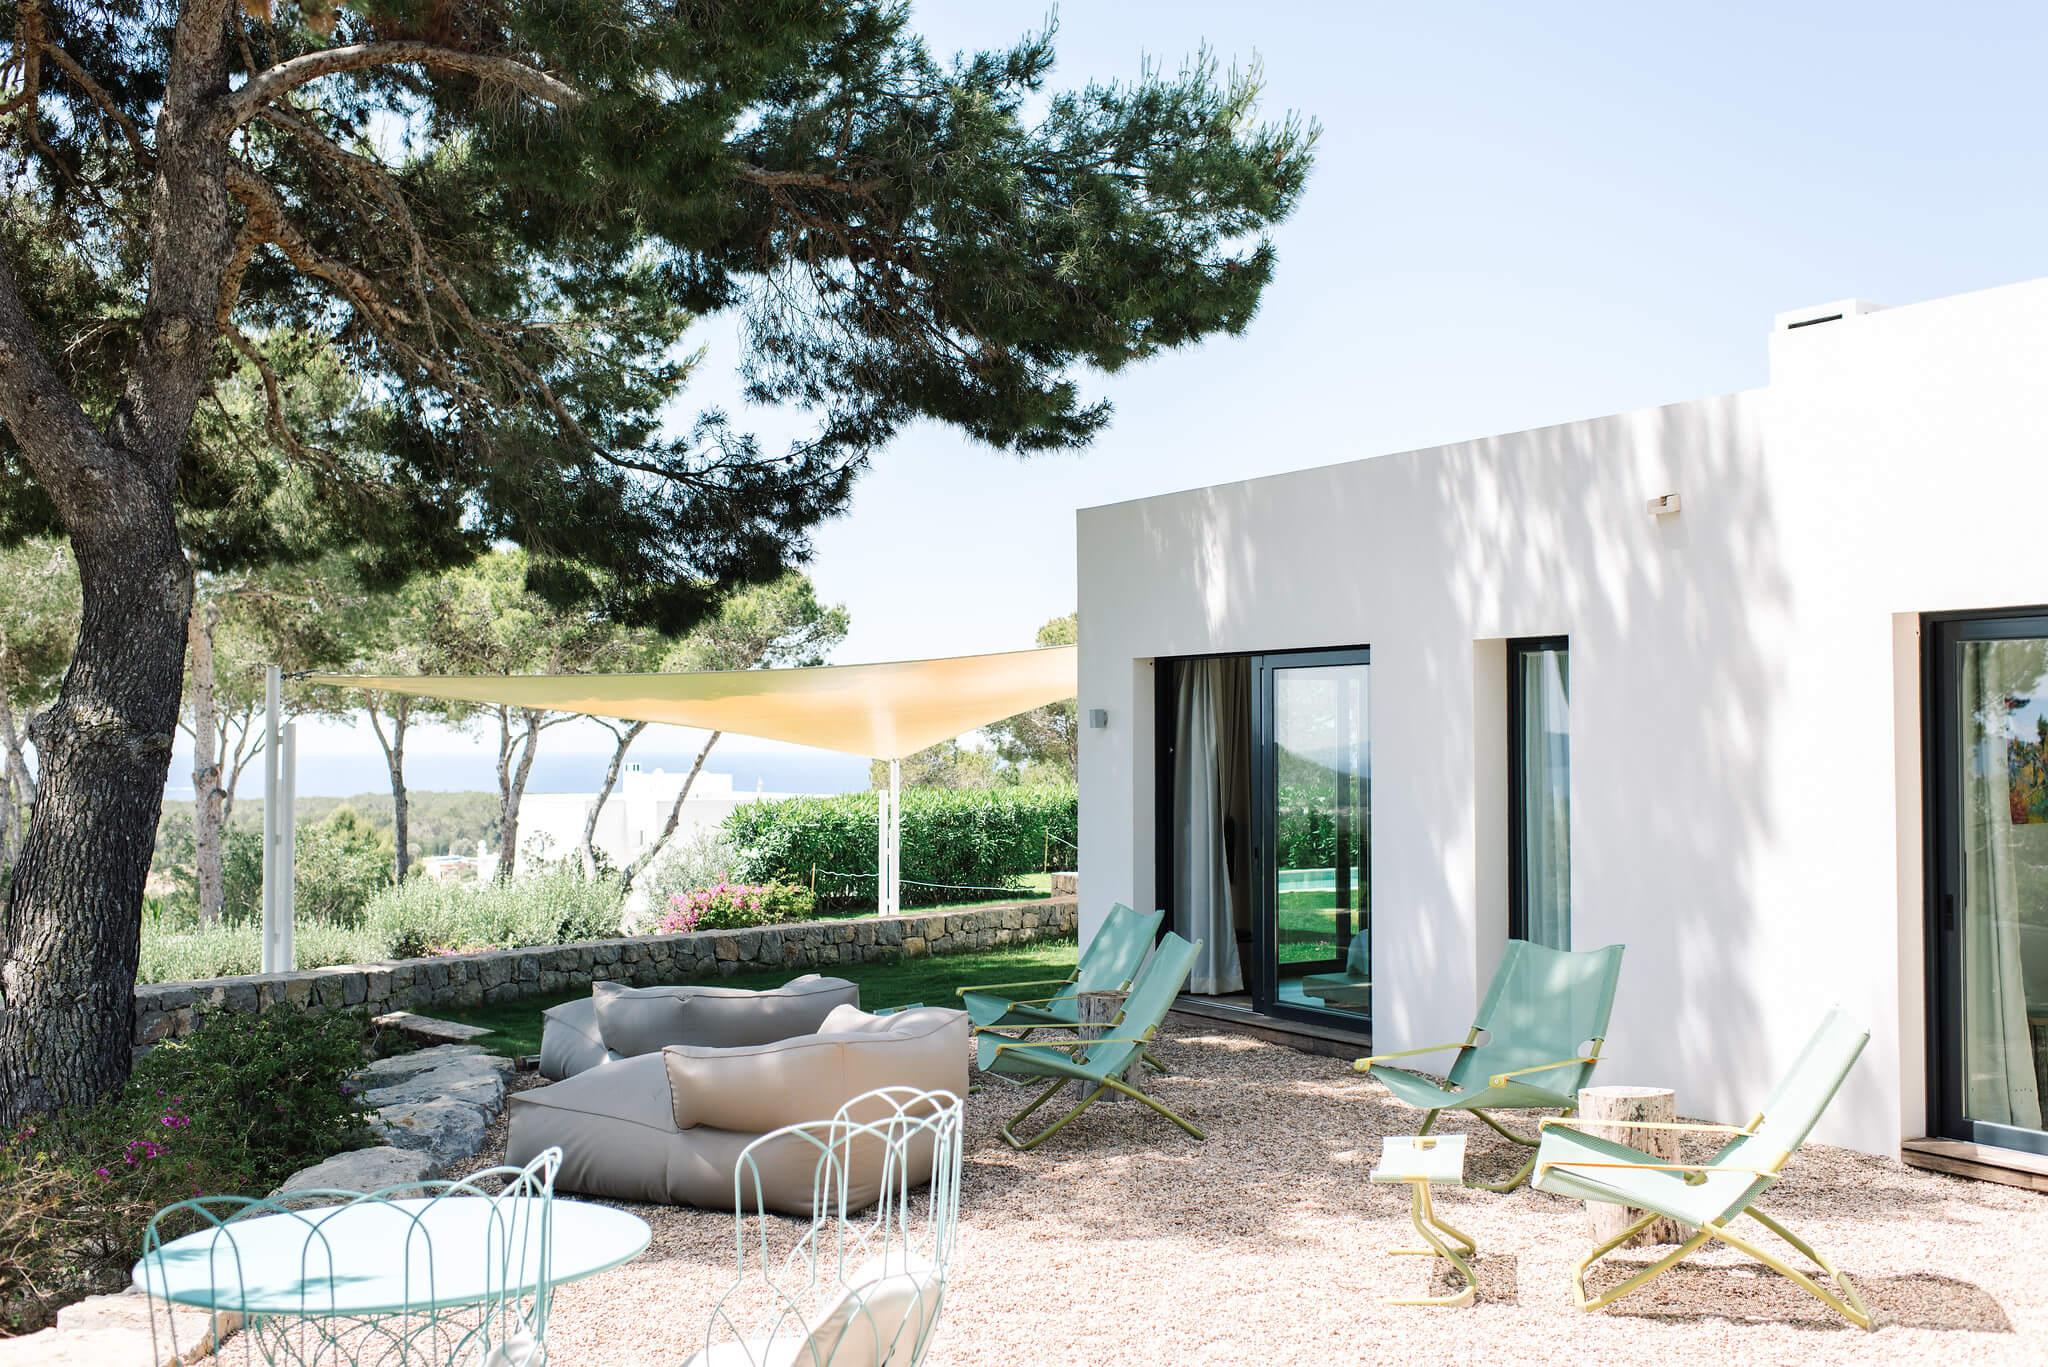 https://www.white-ibiza.com/wp-content/uploads/2020/06/white-ibiza-villas-can-jondal-exterior-seating.jpg